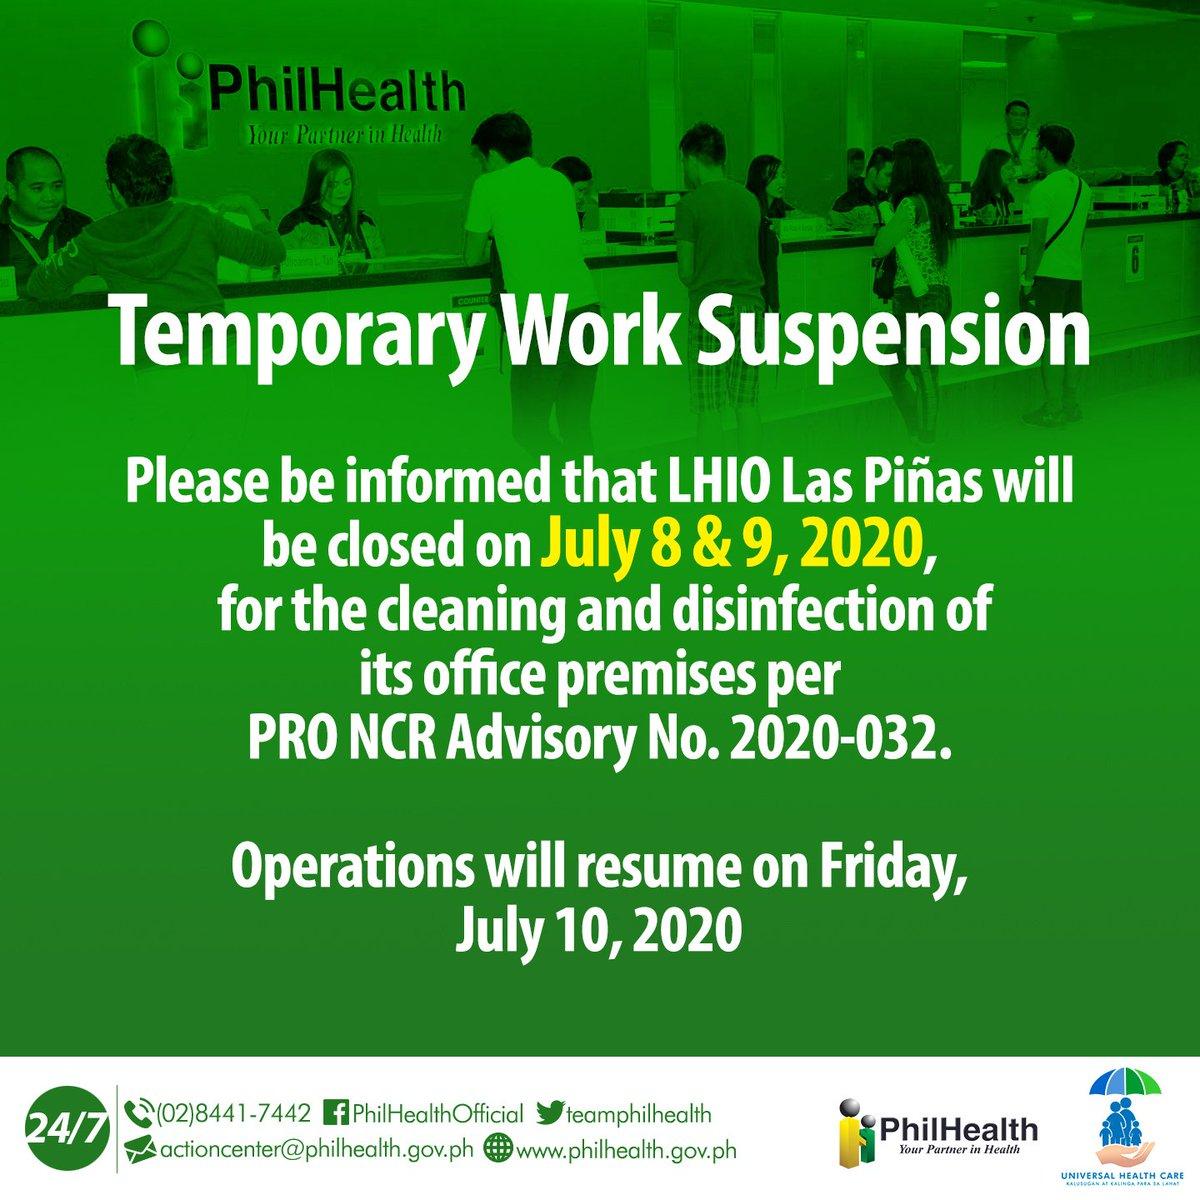 Philhealth On Twitter Please Be Informed That Lhio Las Pinas